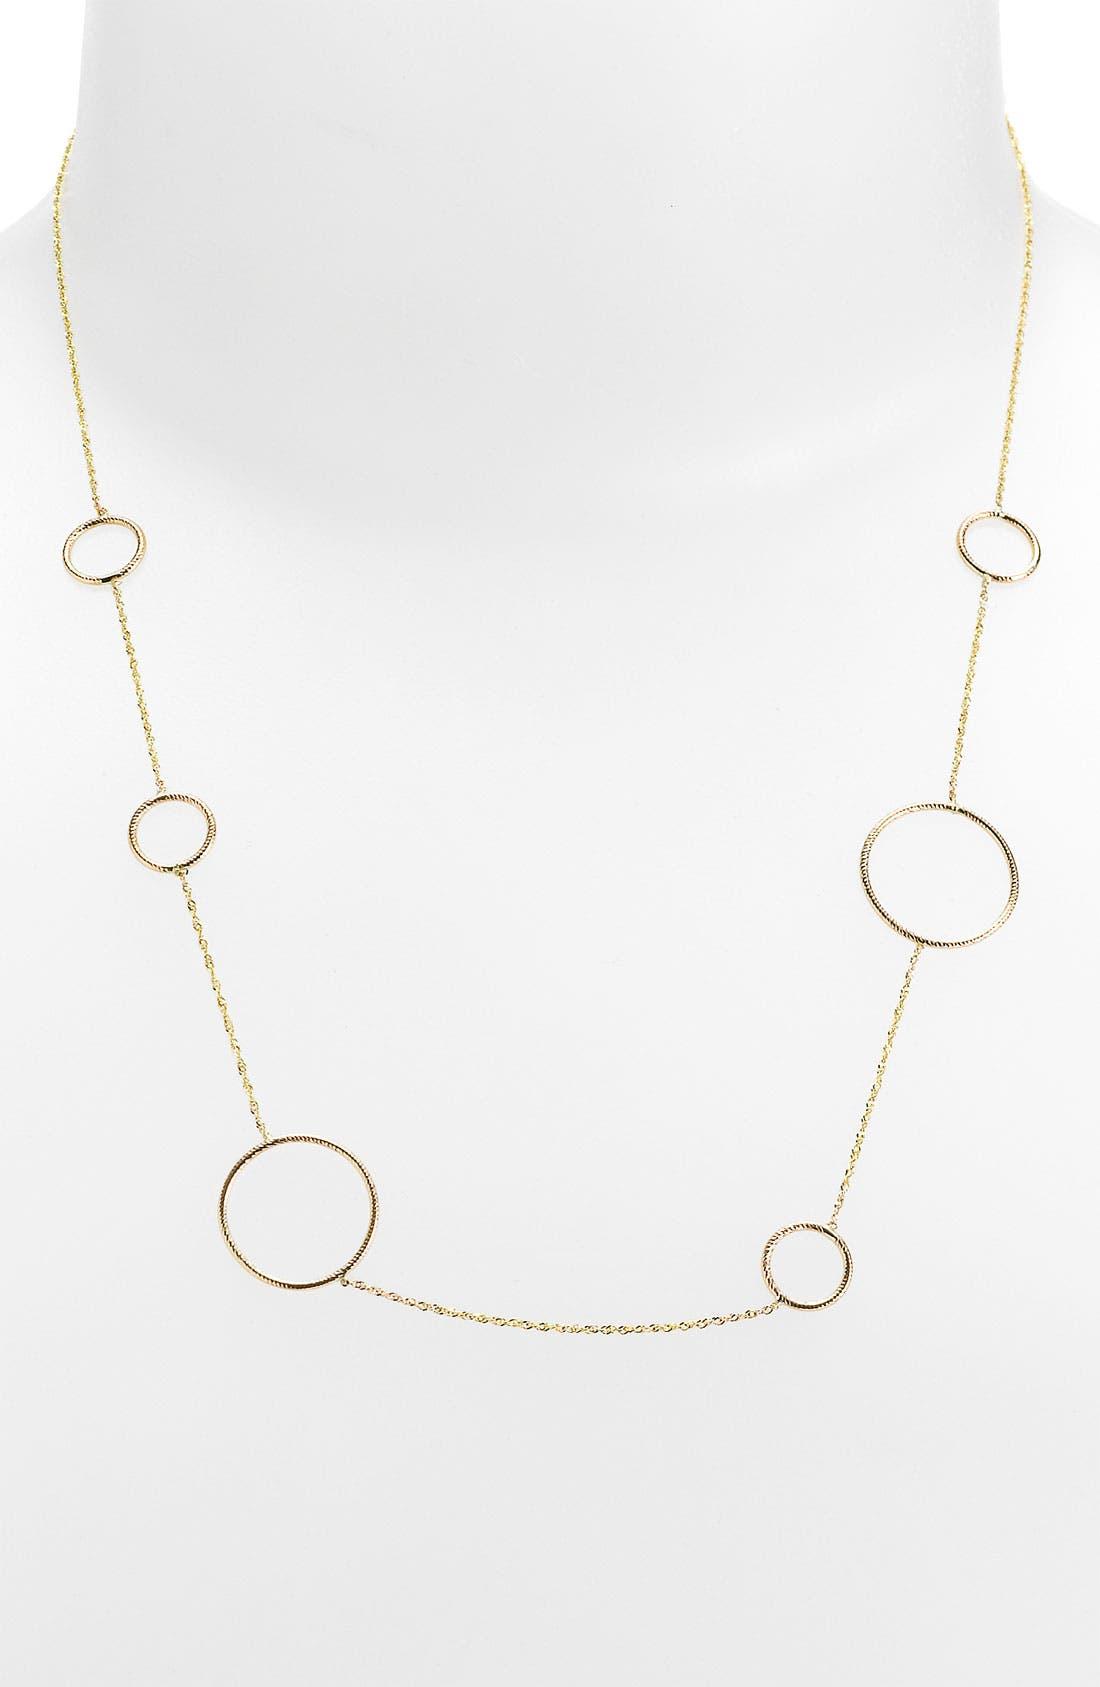 Alternate Image 1 Selected - Lana Jewelry 'Short Adoring' Necklace